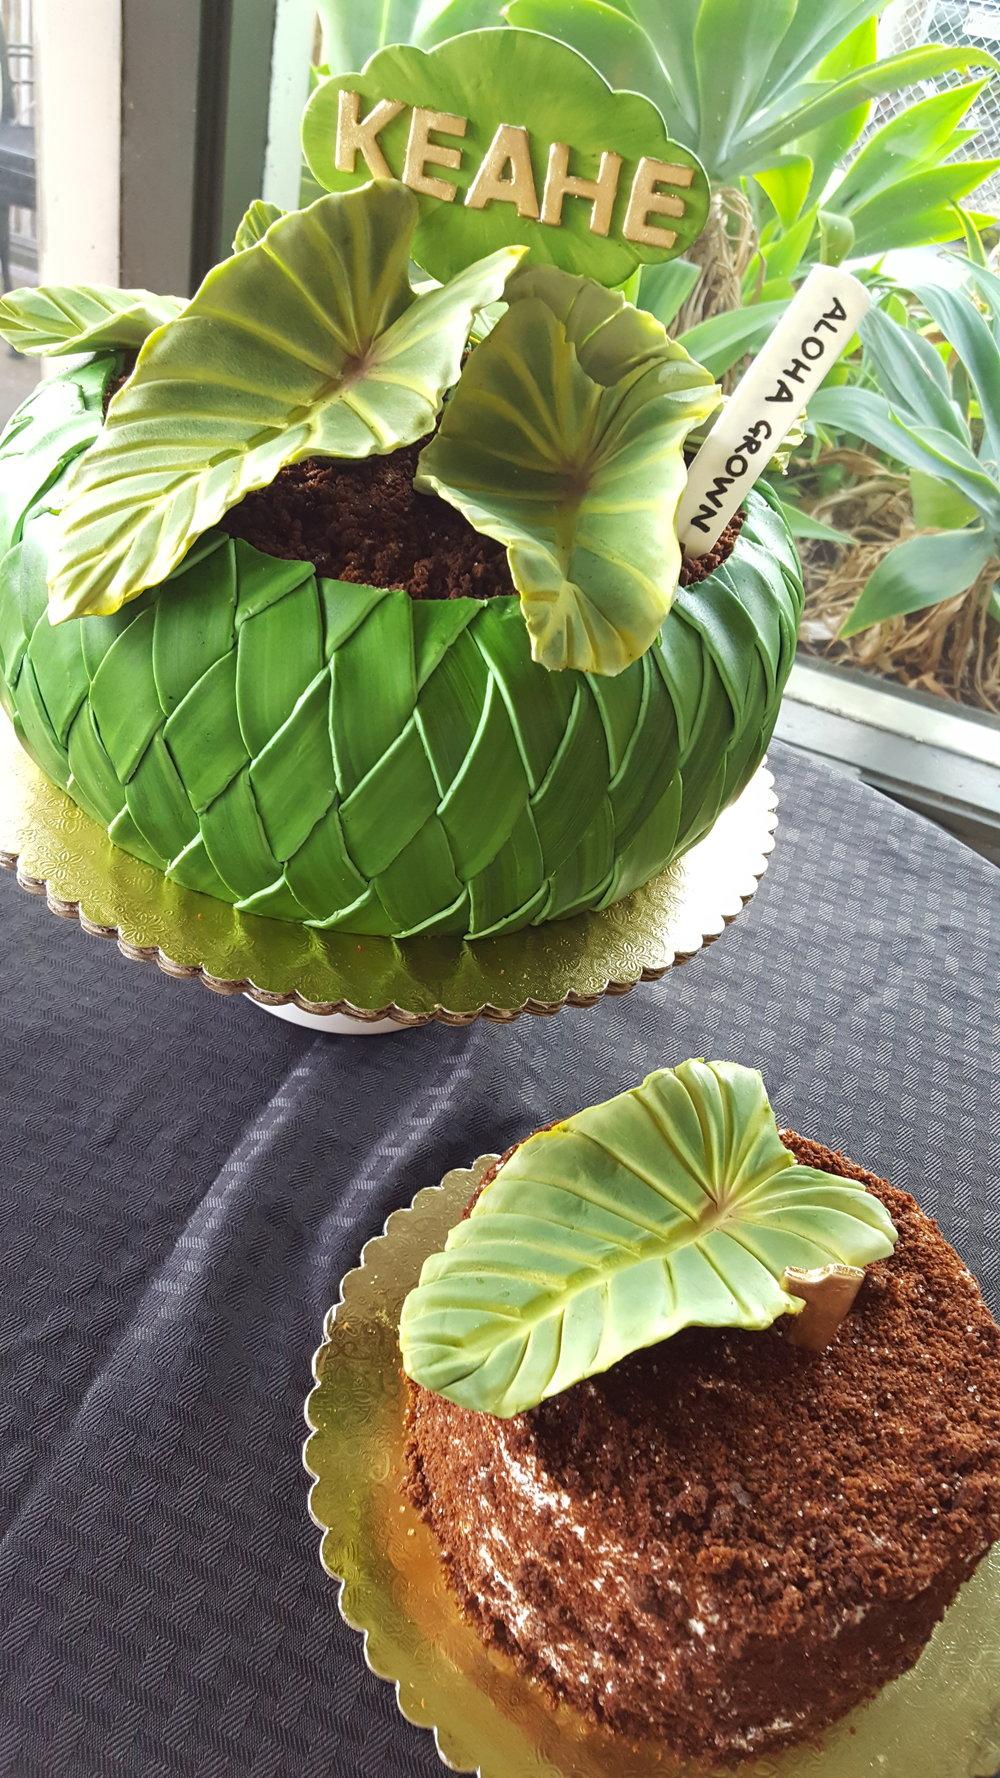 sculpted woven rolled fondant basket birthday cake with sugar taro (kalo) Hilo Hawaii Big Island Kailua-Kona